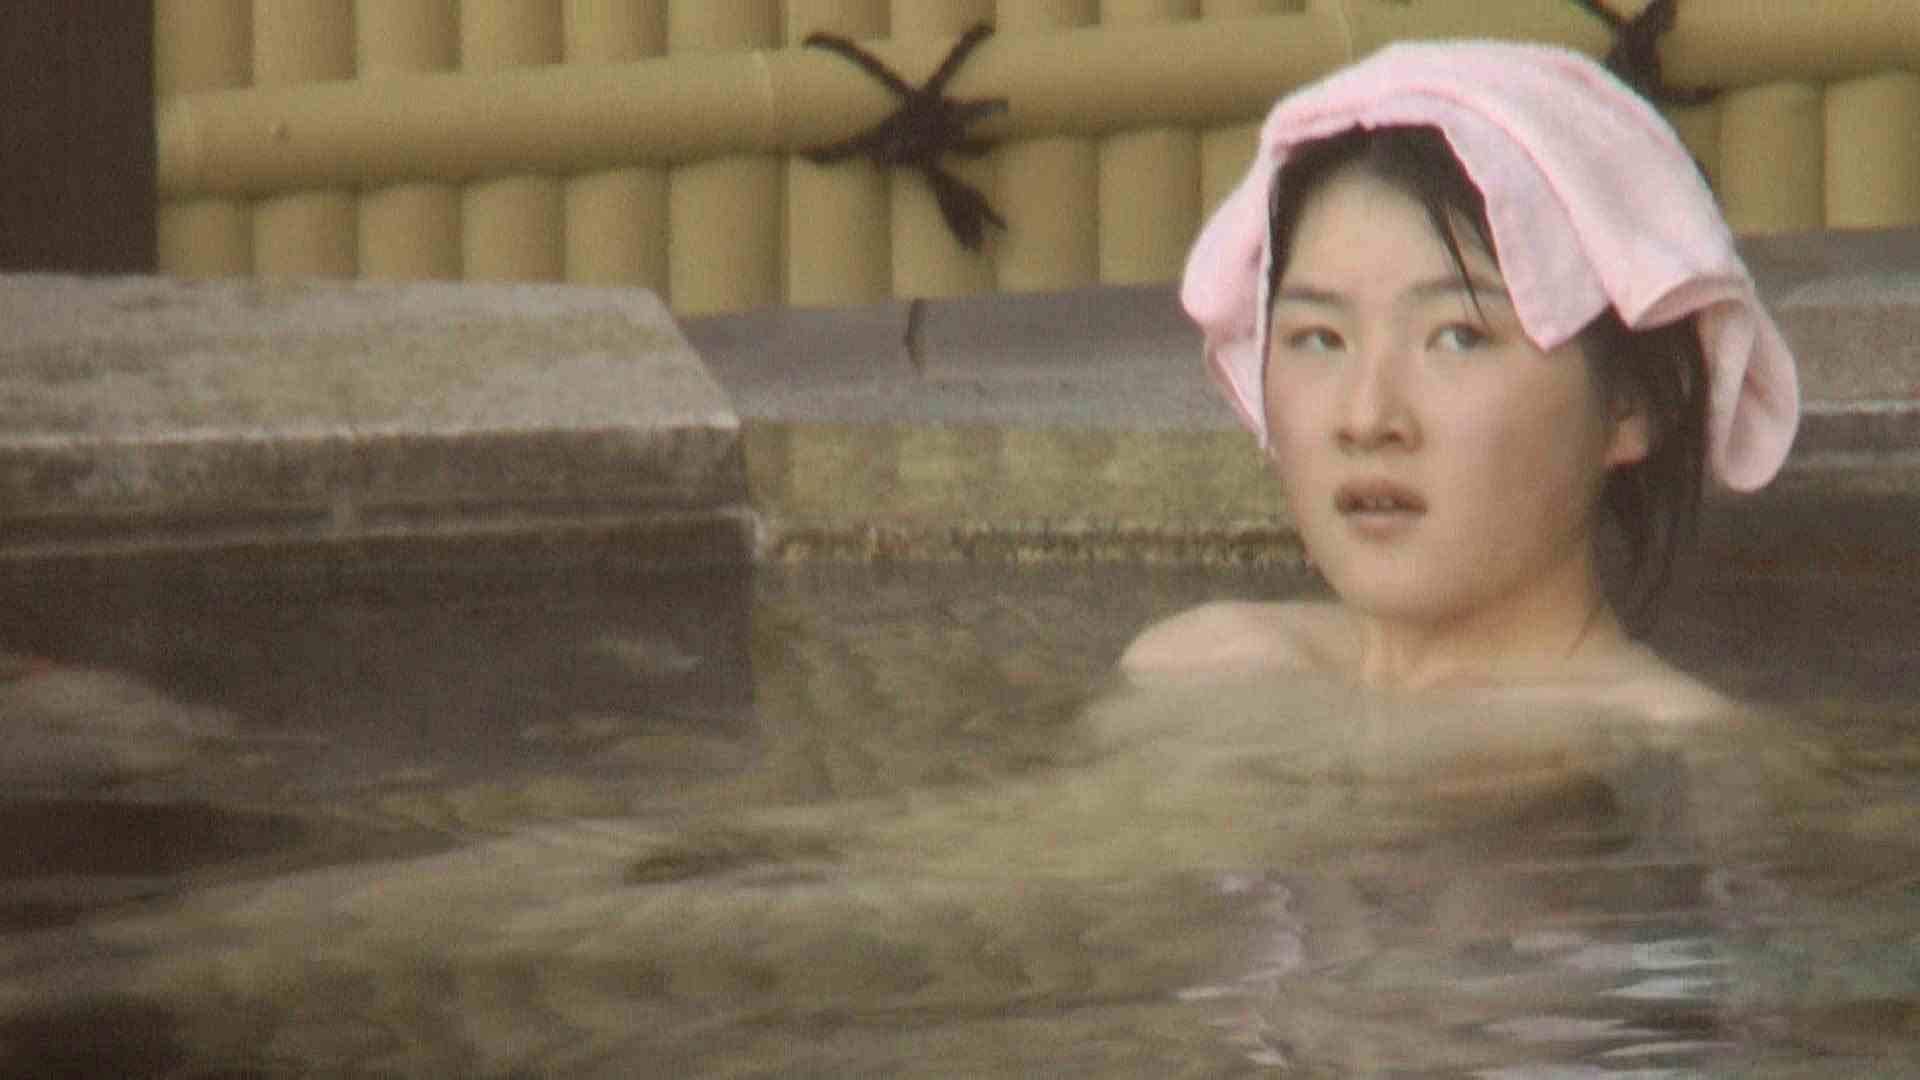 Aquaな露天風呂Vol.207 露天風呂編 | 盗撮シリーズ  109PIX 83